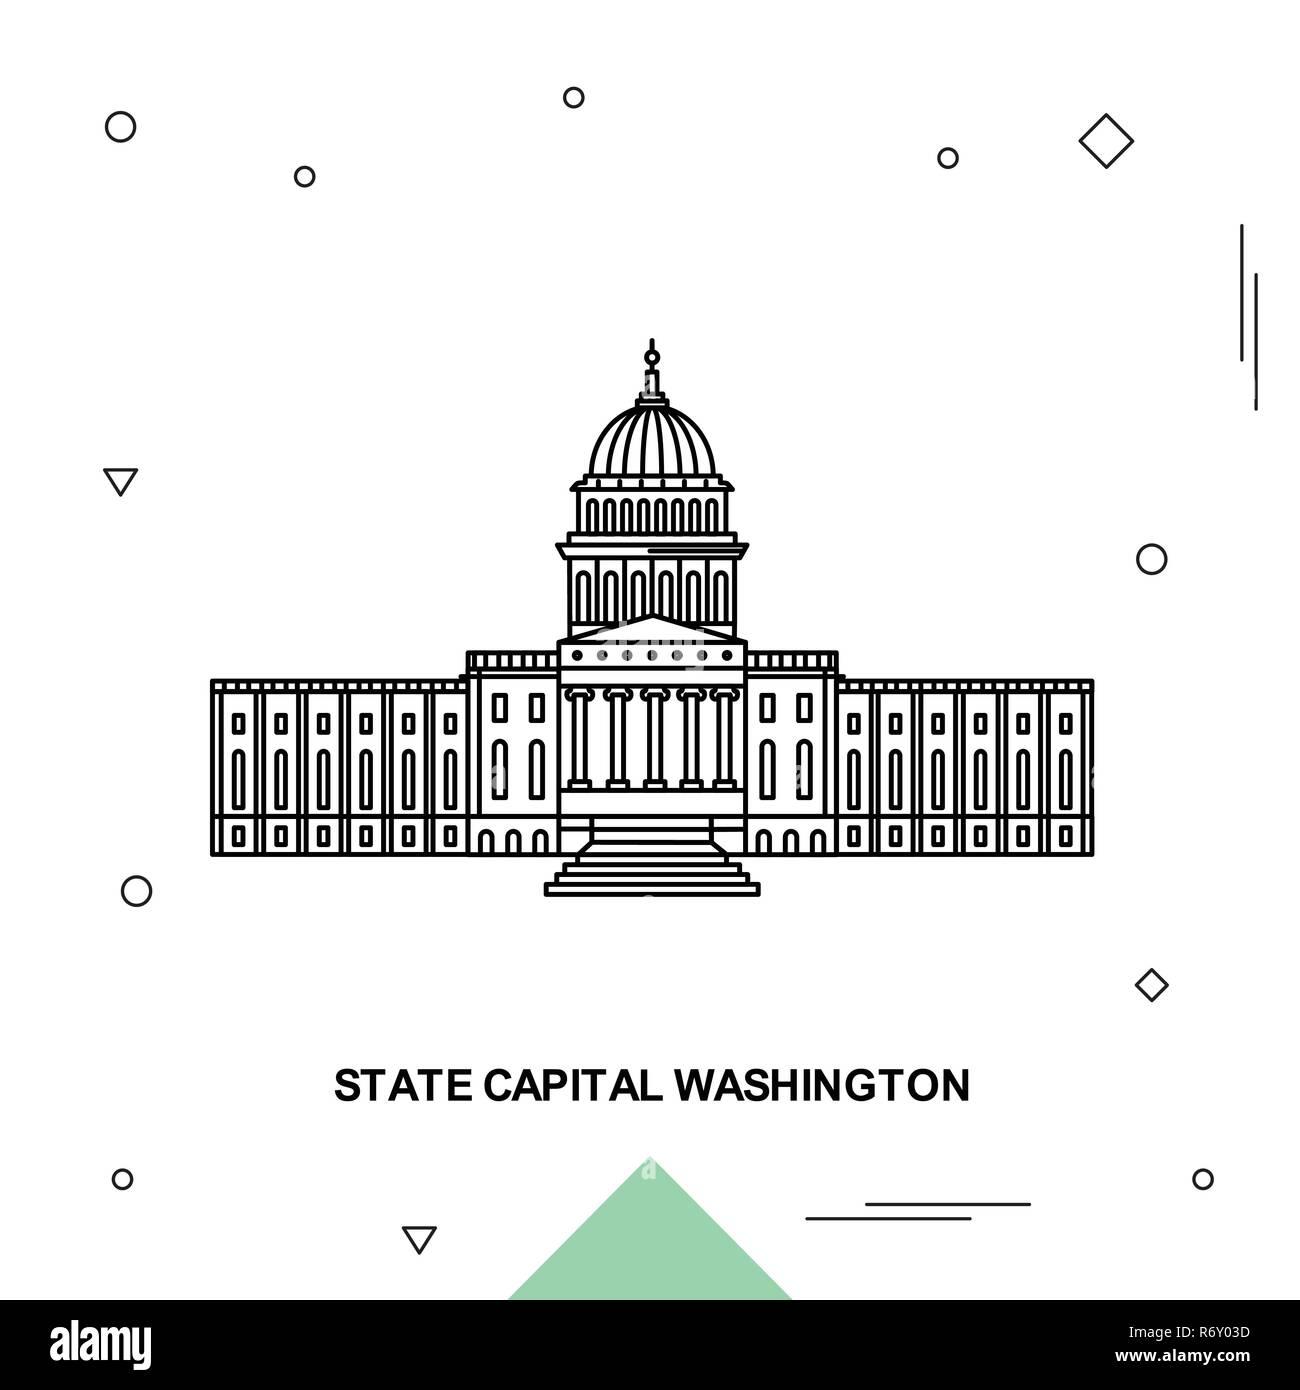 STATE CAPITAL WASHINGTON - Stock Vector